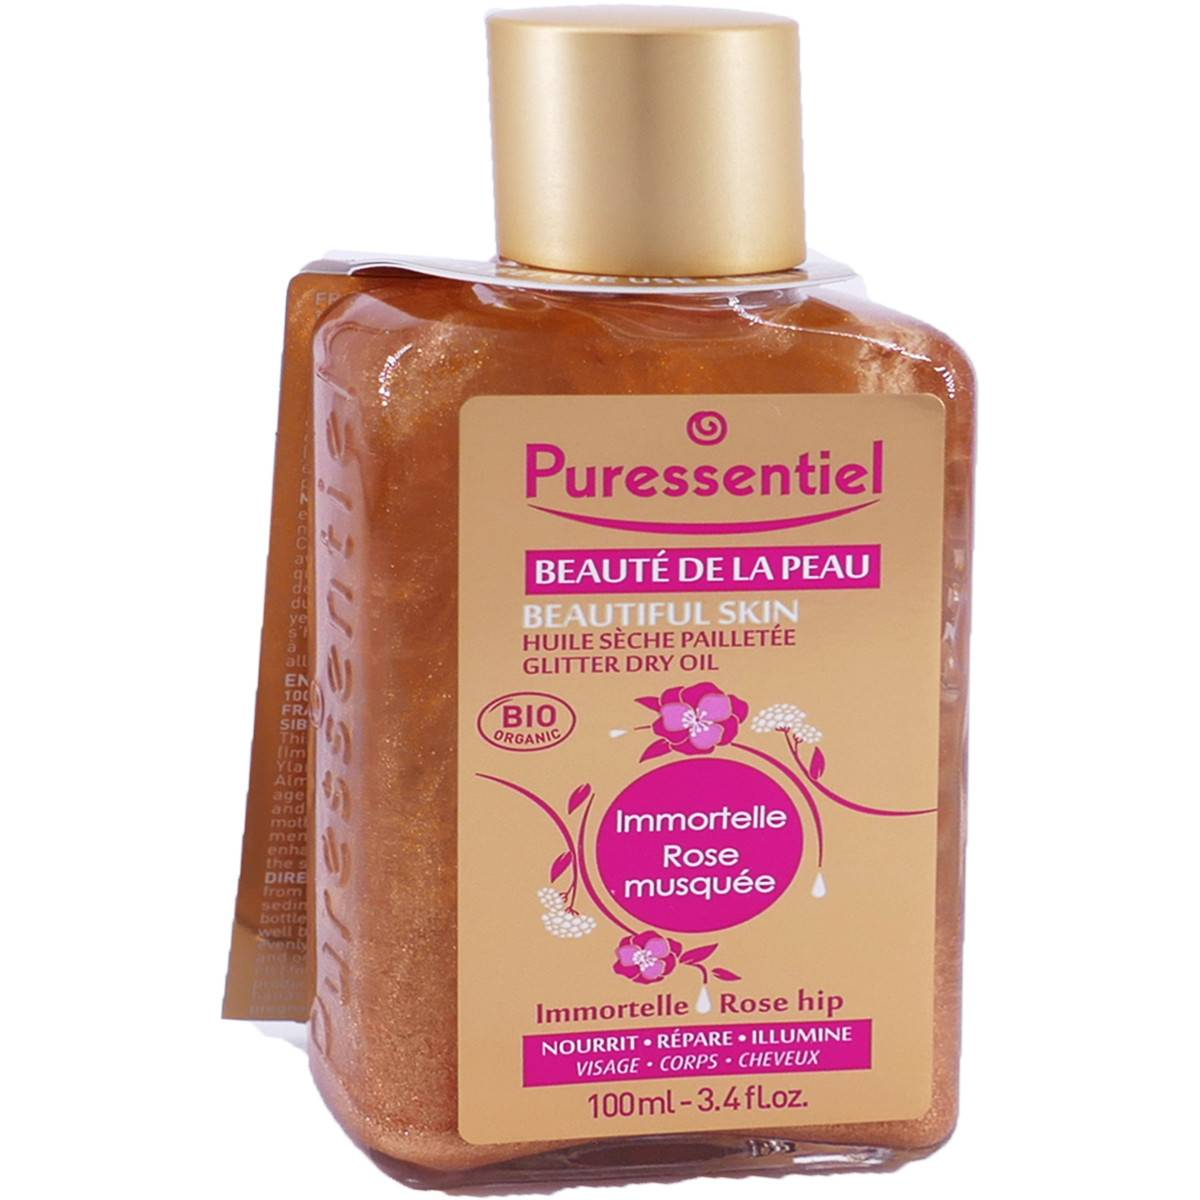 Puressentiel immortelle rose musquee 100 ml